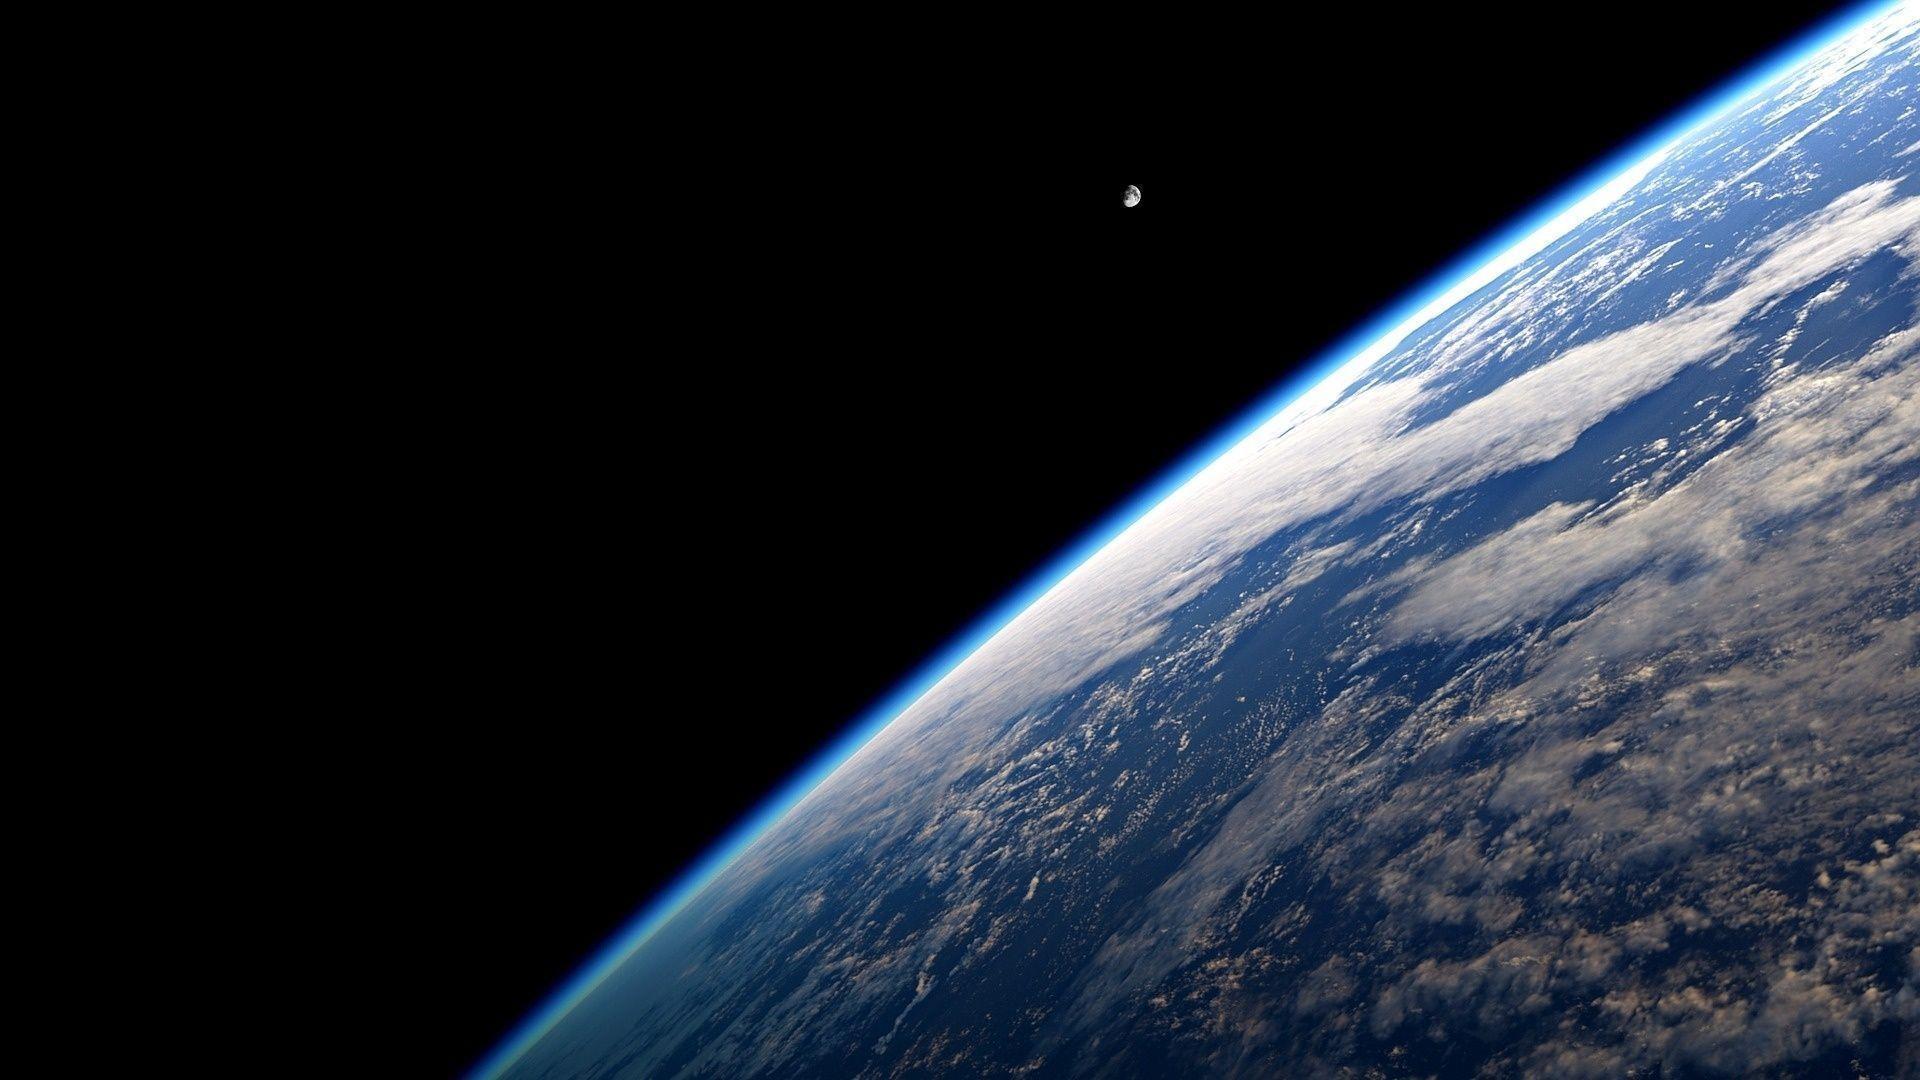 earth wallpaper hd 1080p - photo #14